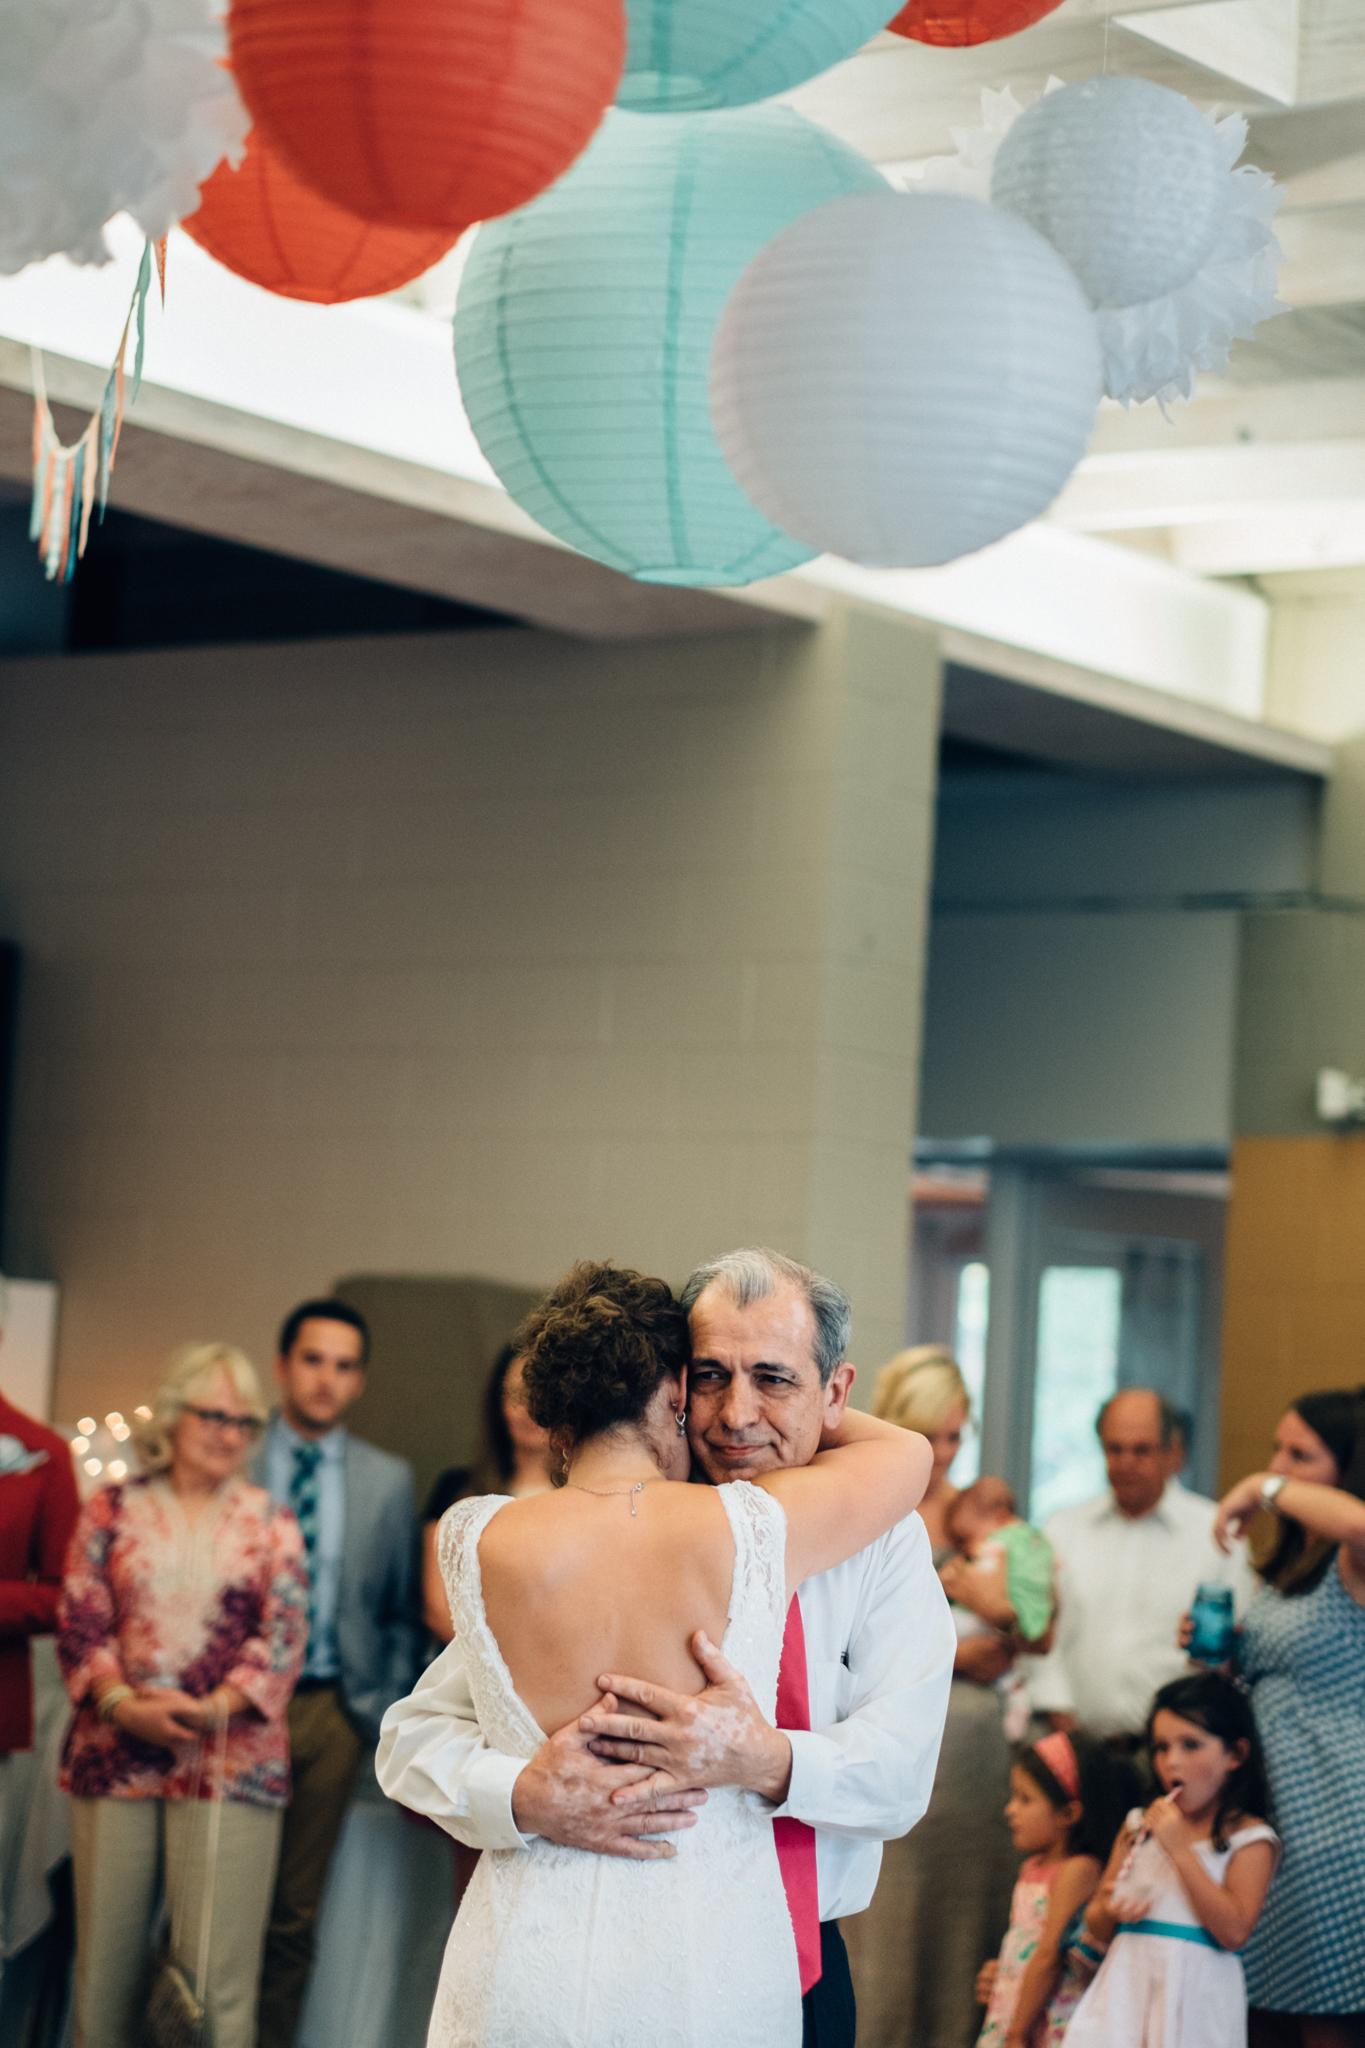 Allie&Brenton_Wedding_0115.jpg